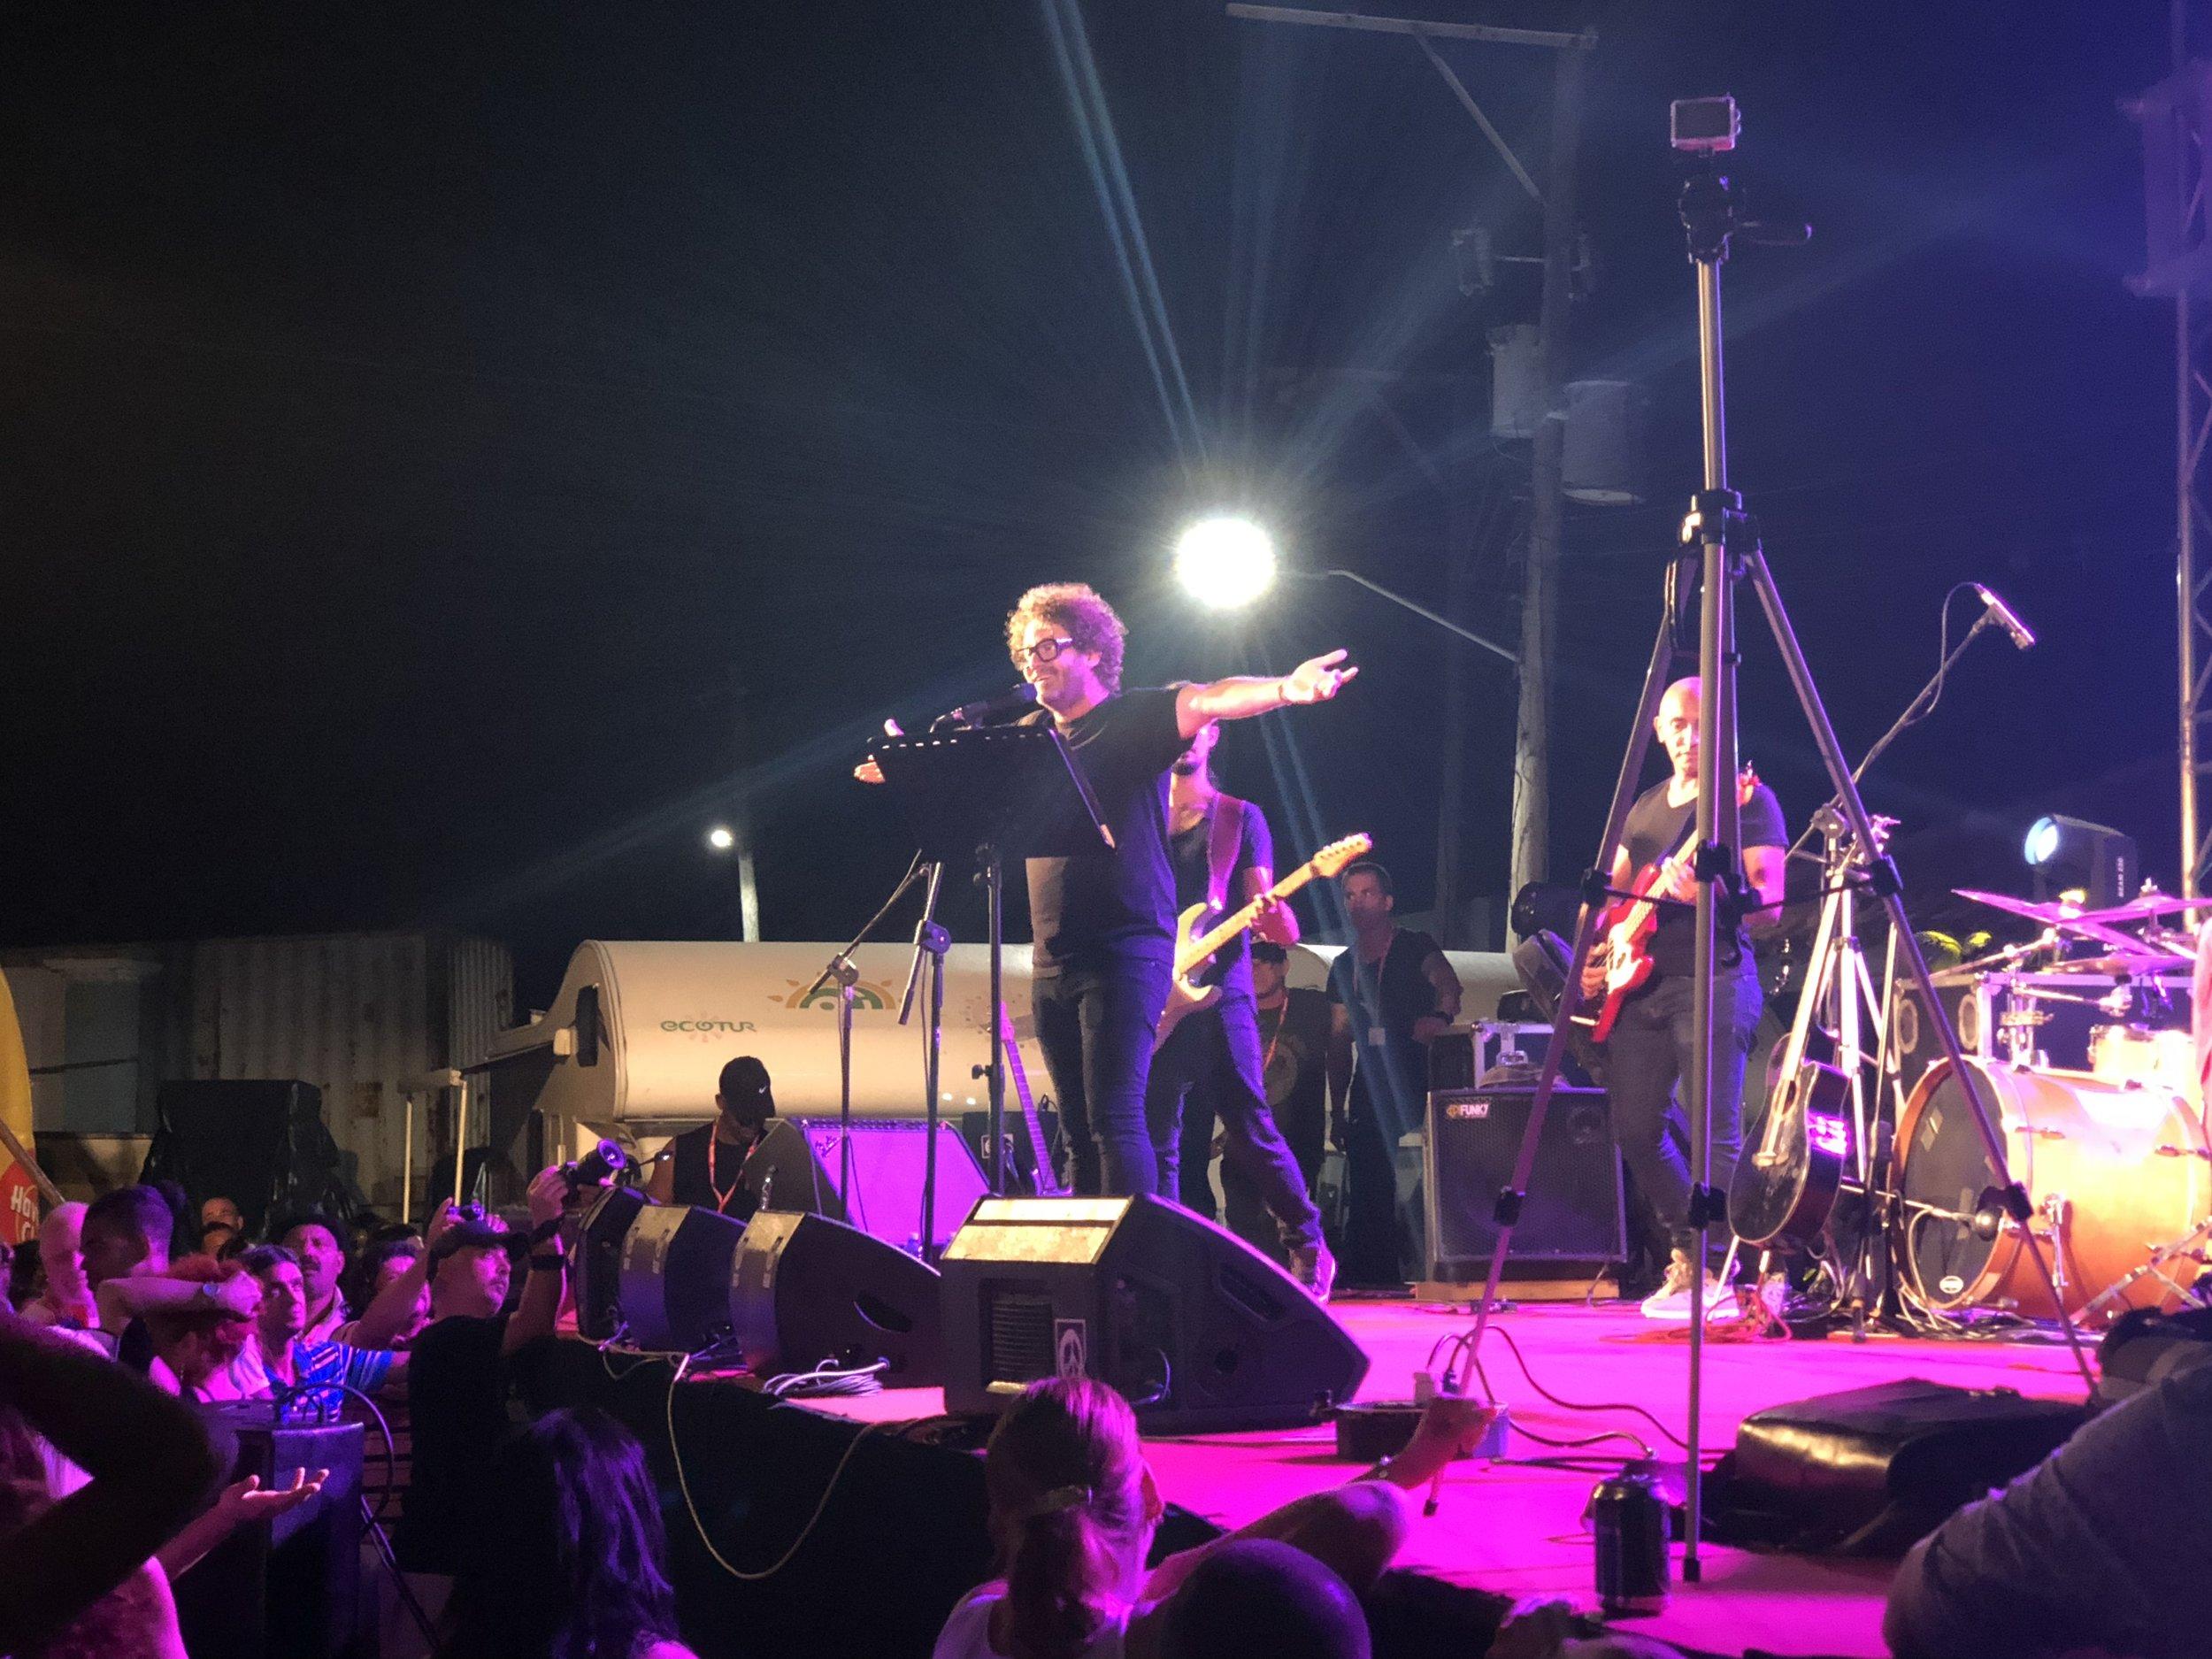 Cuban pop singer Raul Paz dazzles the crowd at Gibara.